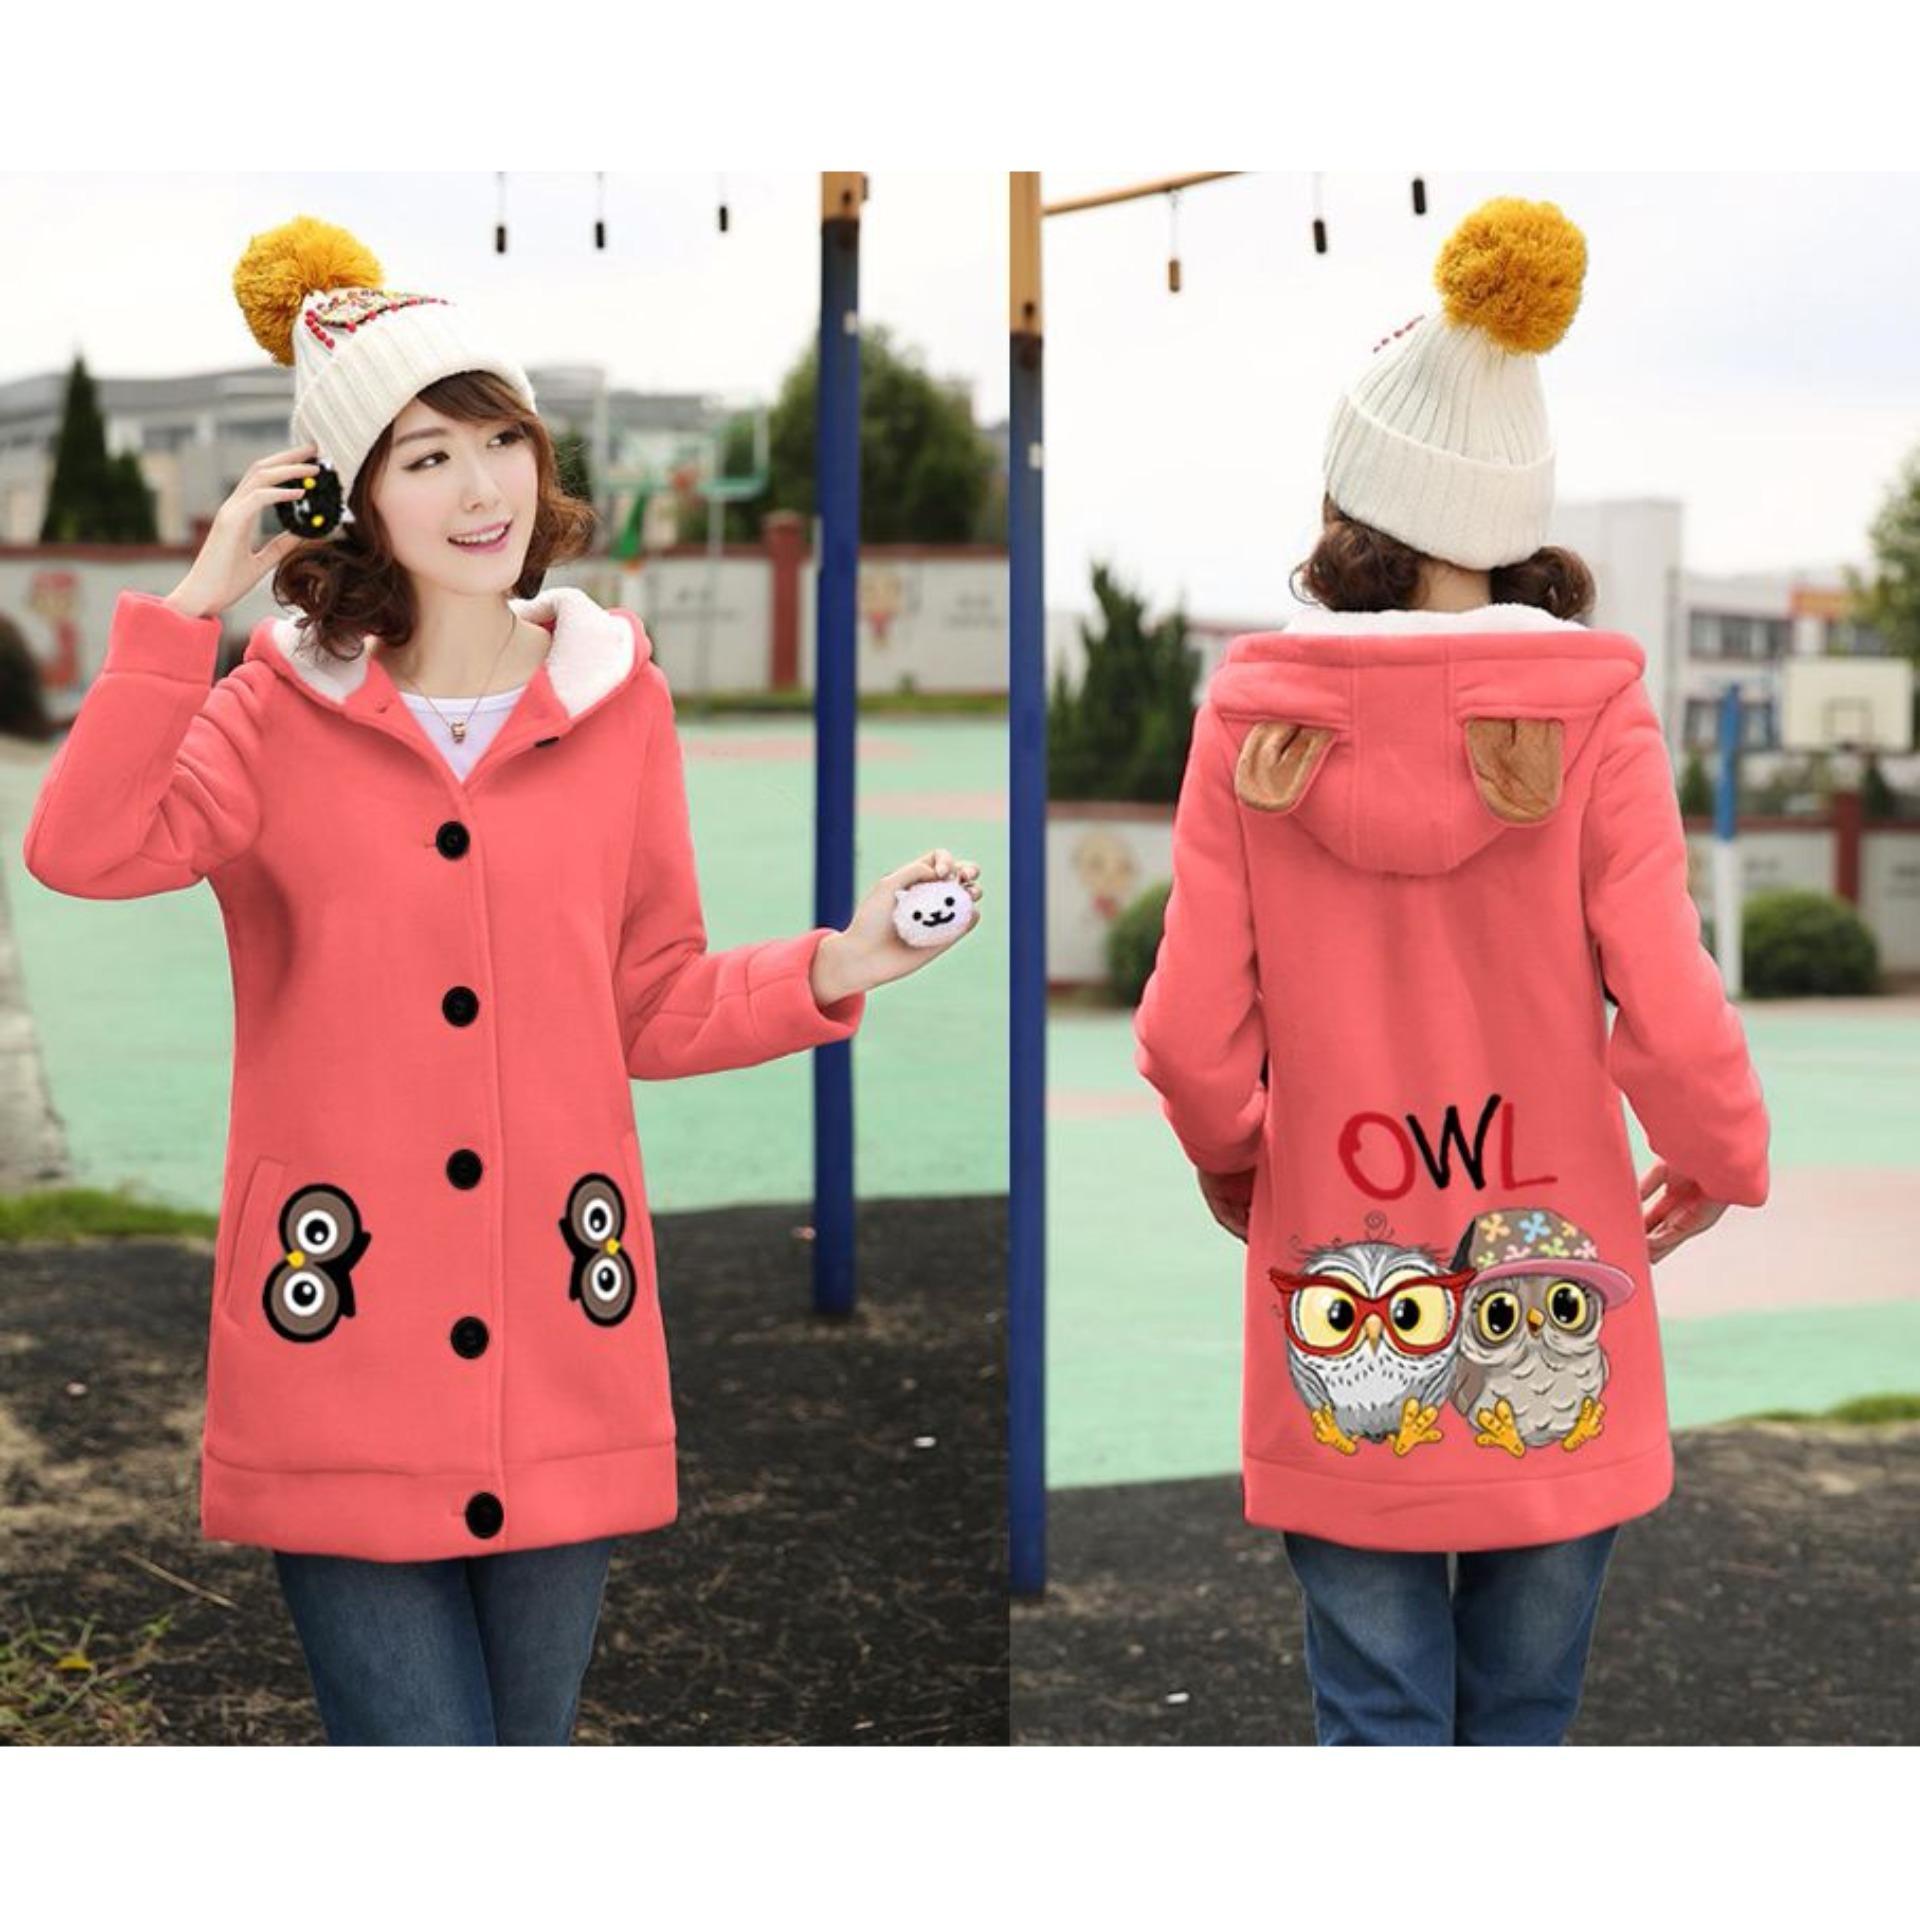 Vrichel Collection Jaket / Coat / Blazer / Hoodie / Jaket Hoodie Wanita OWL Dewasa